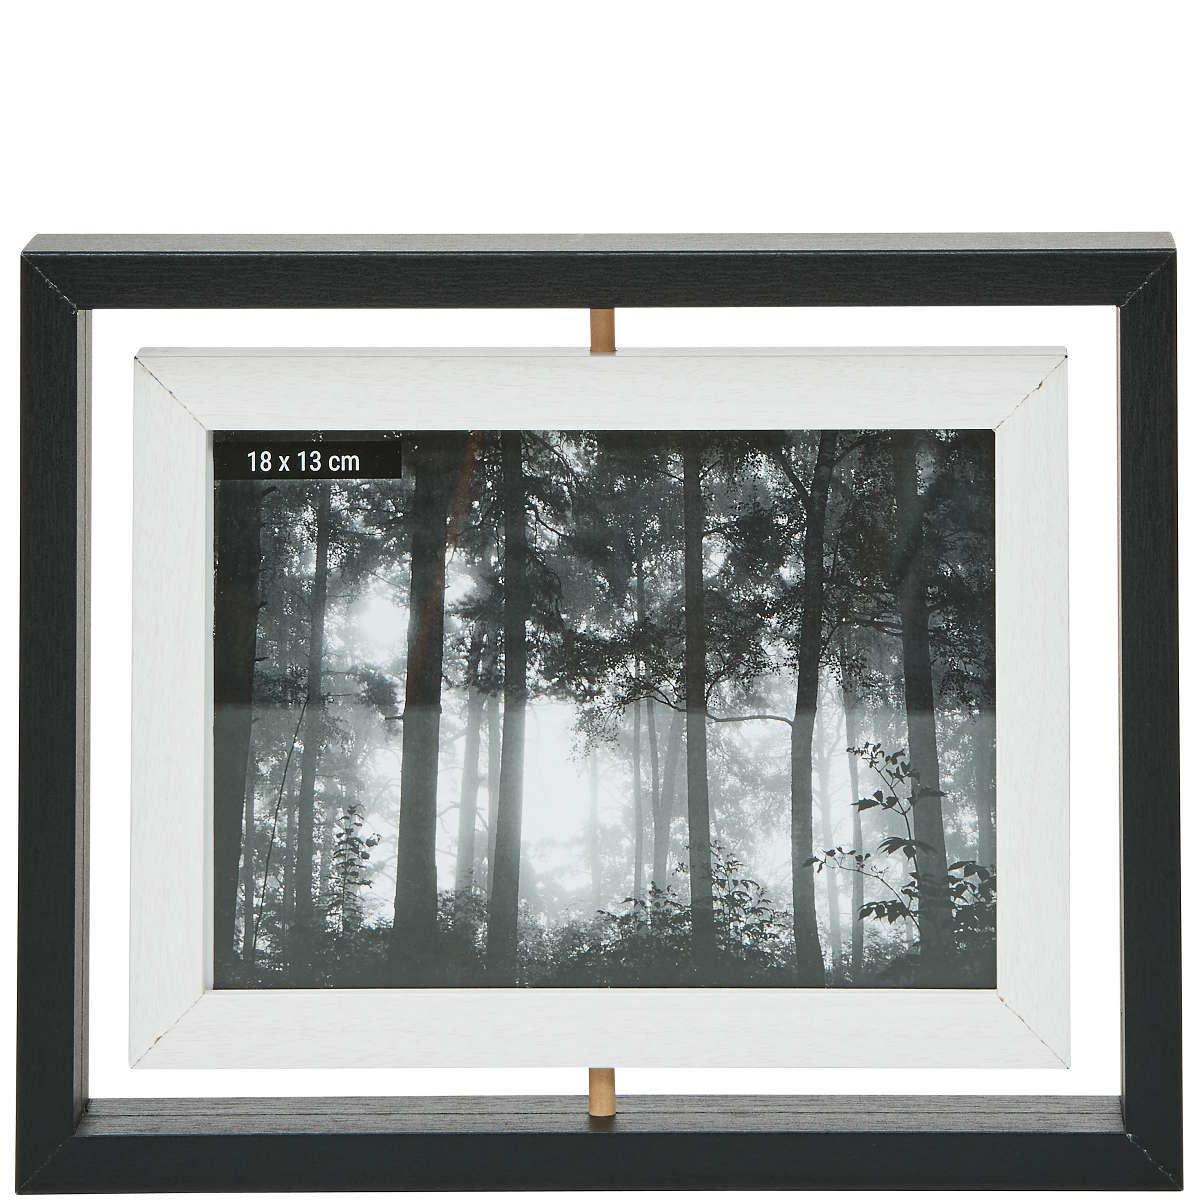 Butlers Picture IT Bilderrahmen zum Wenden 18x13 cm: Amazon.de ...